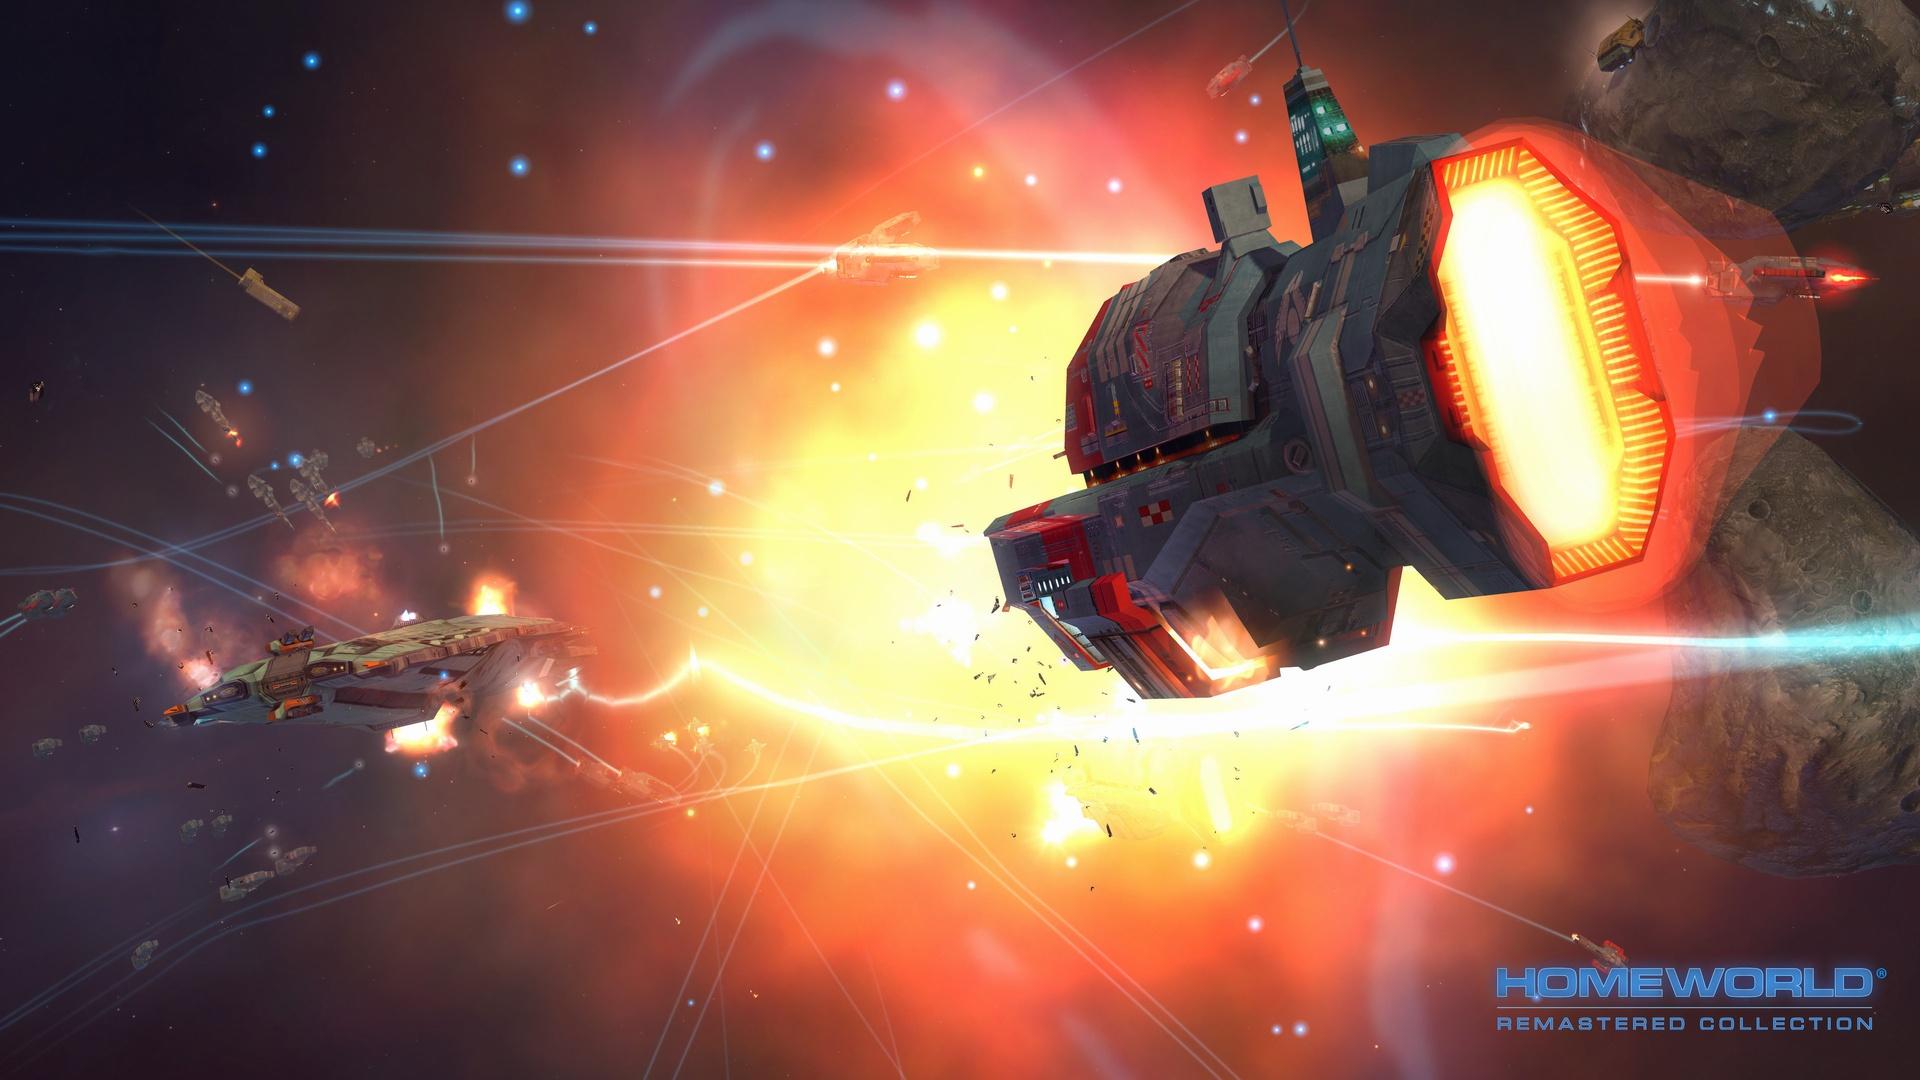 Homeworld Remastered - Screenshot - Torpedo Frigate in Battle - Gearbox